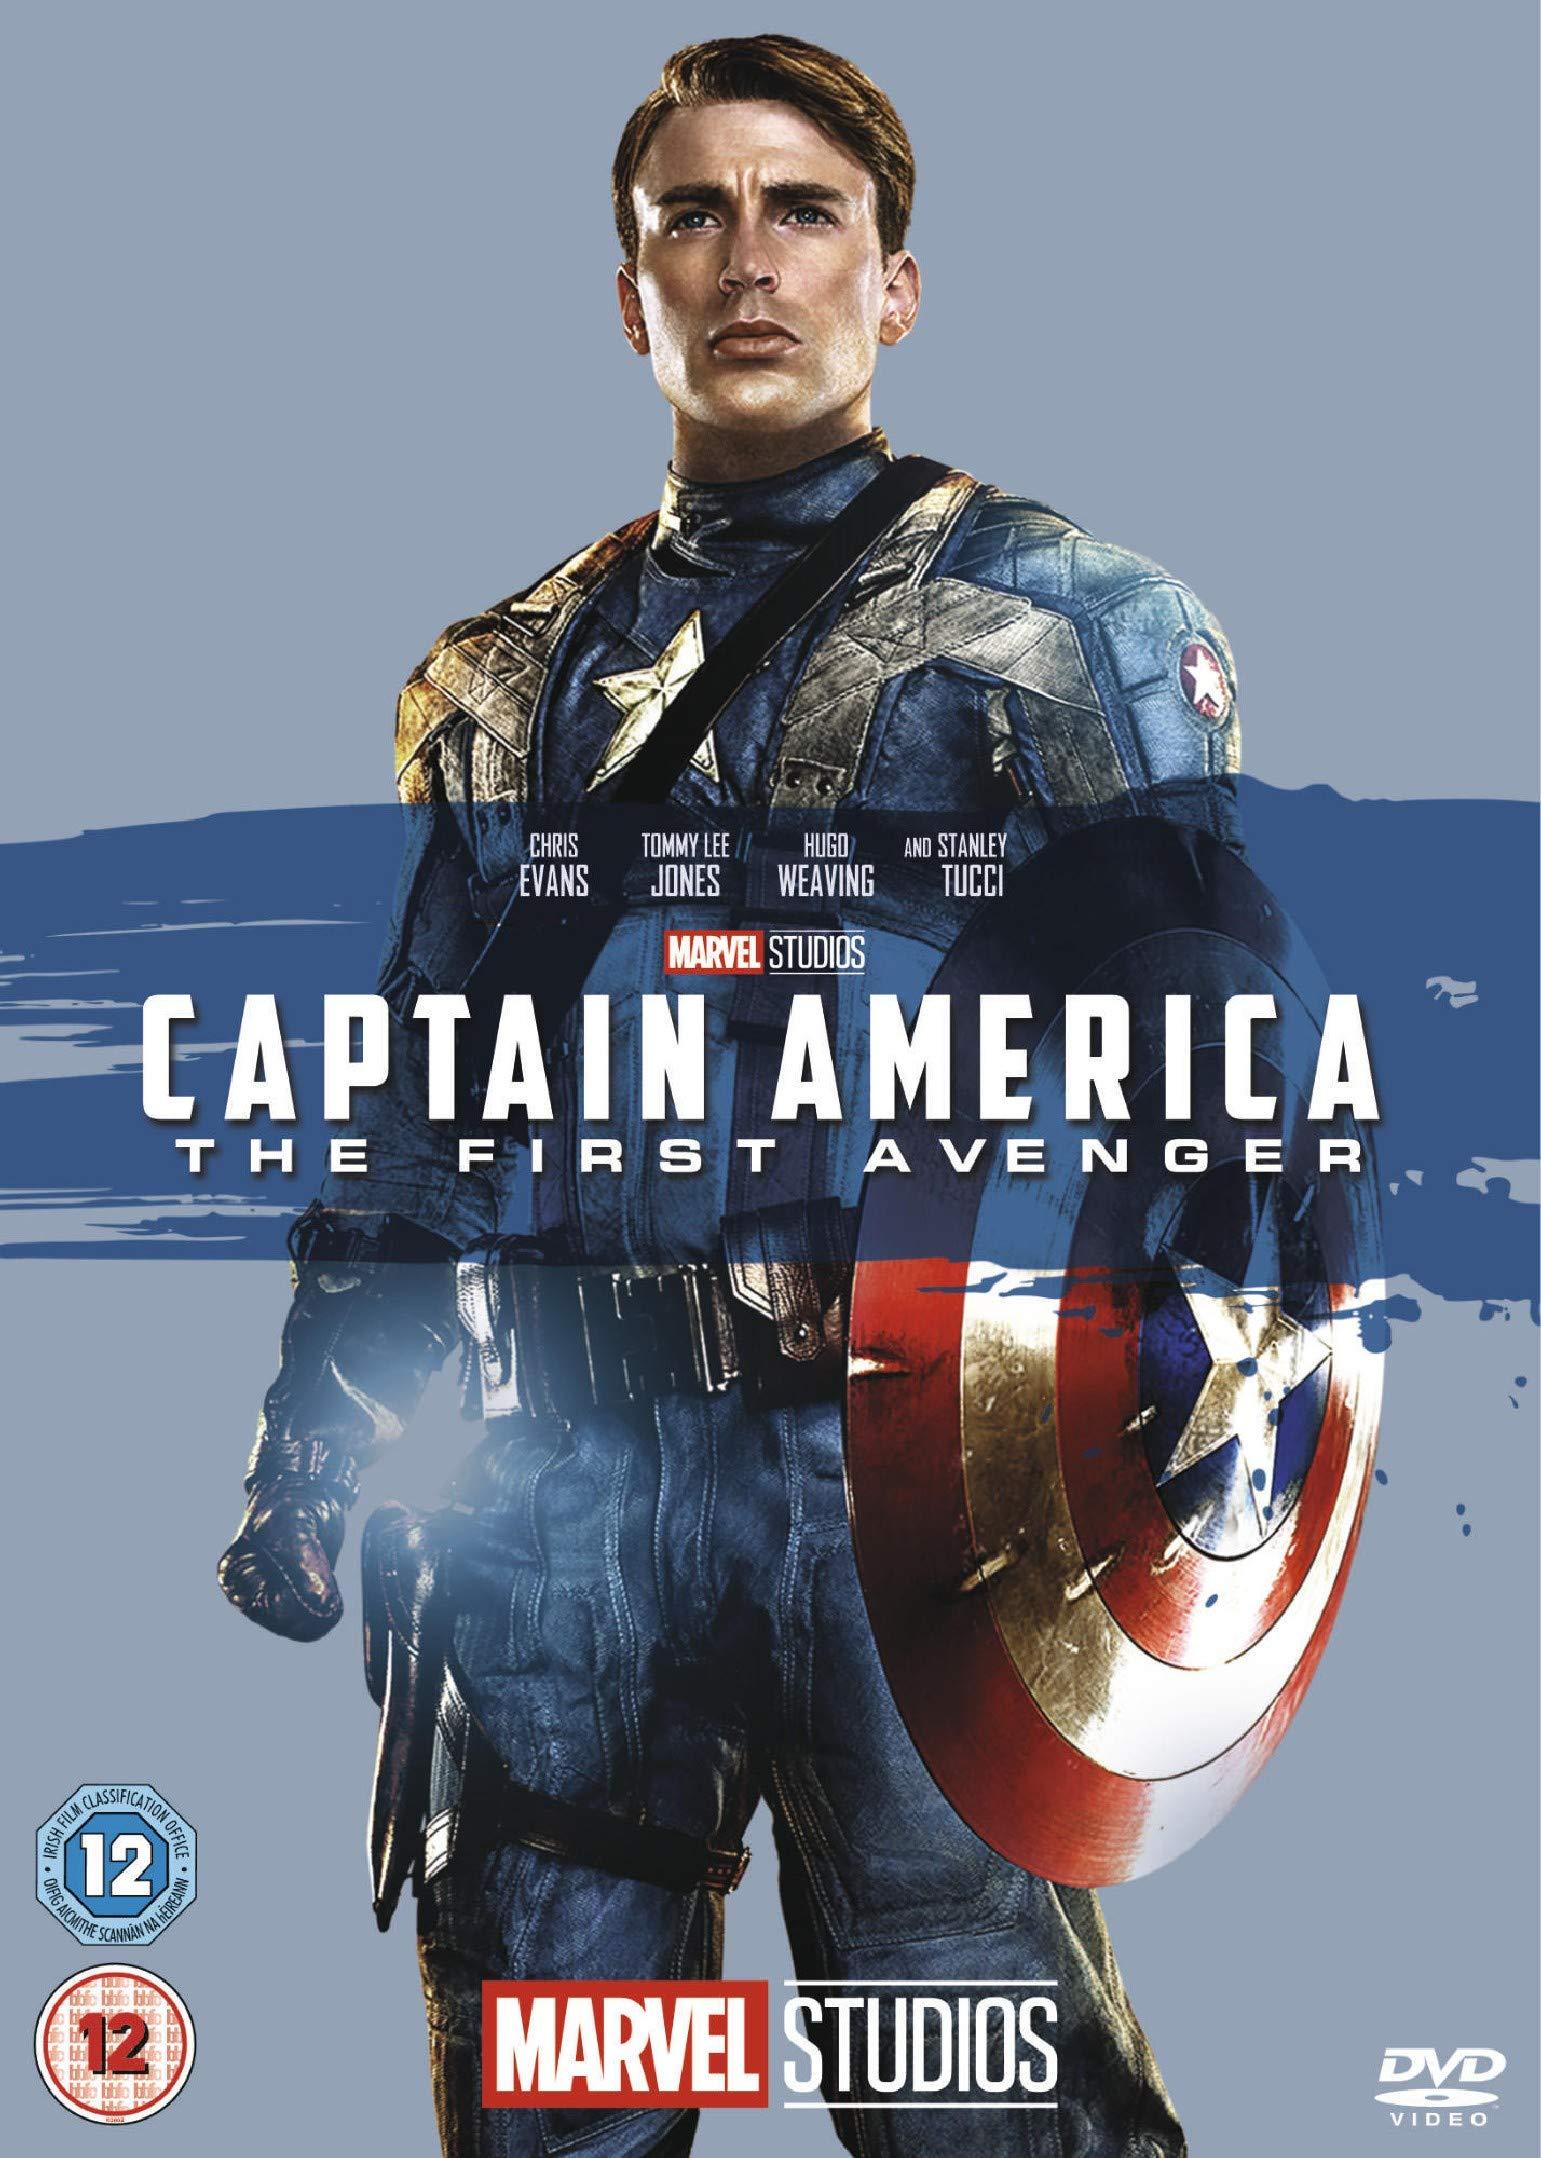 Marvel Cinematic Universe film 5 - Captain America: The First Avenger